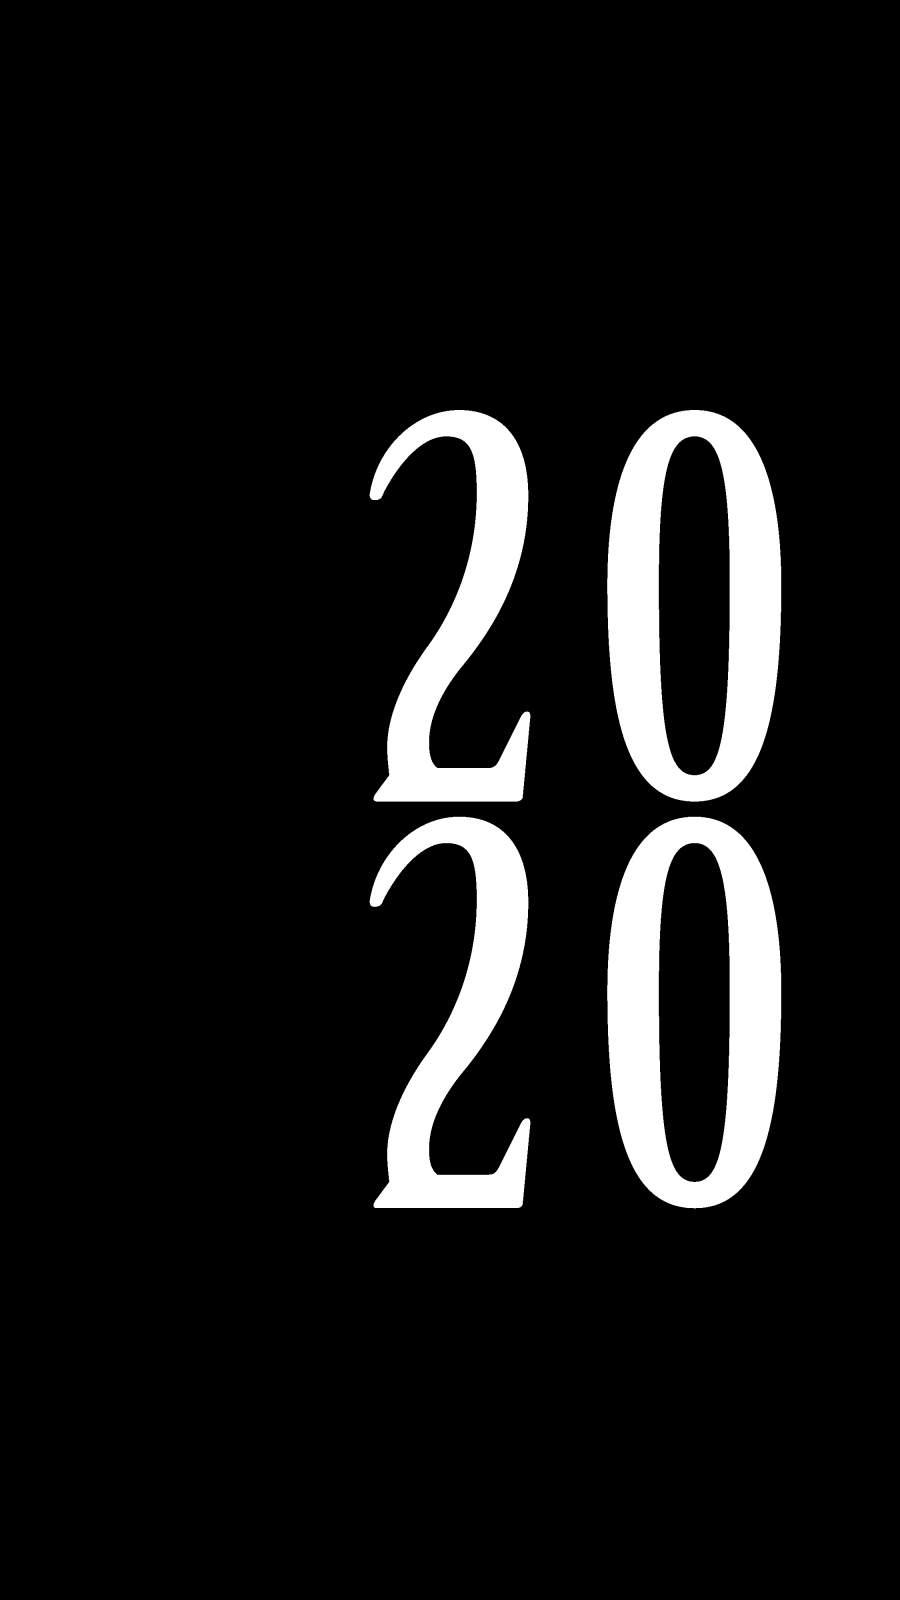 2020 iPhone Wallpaper